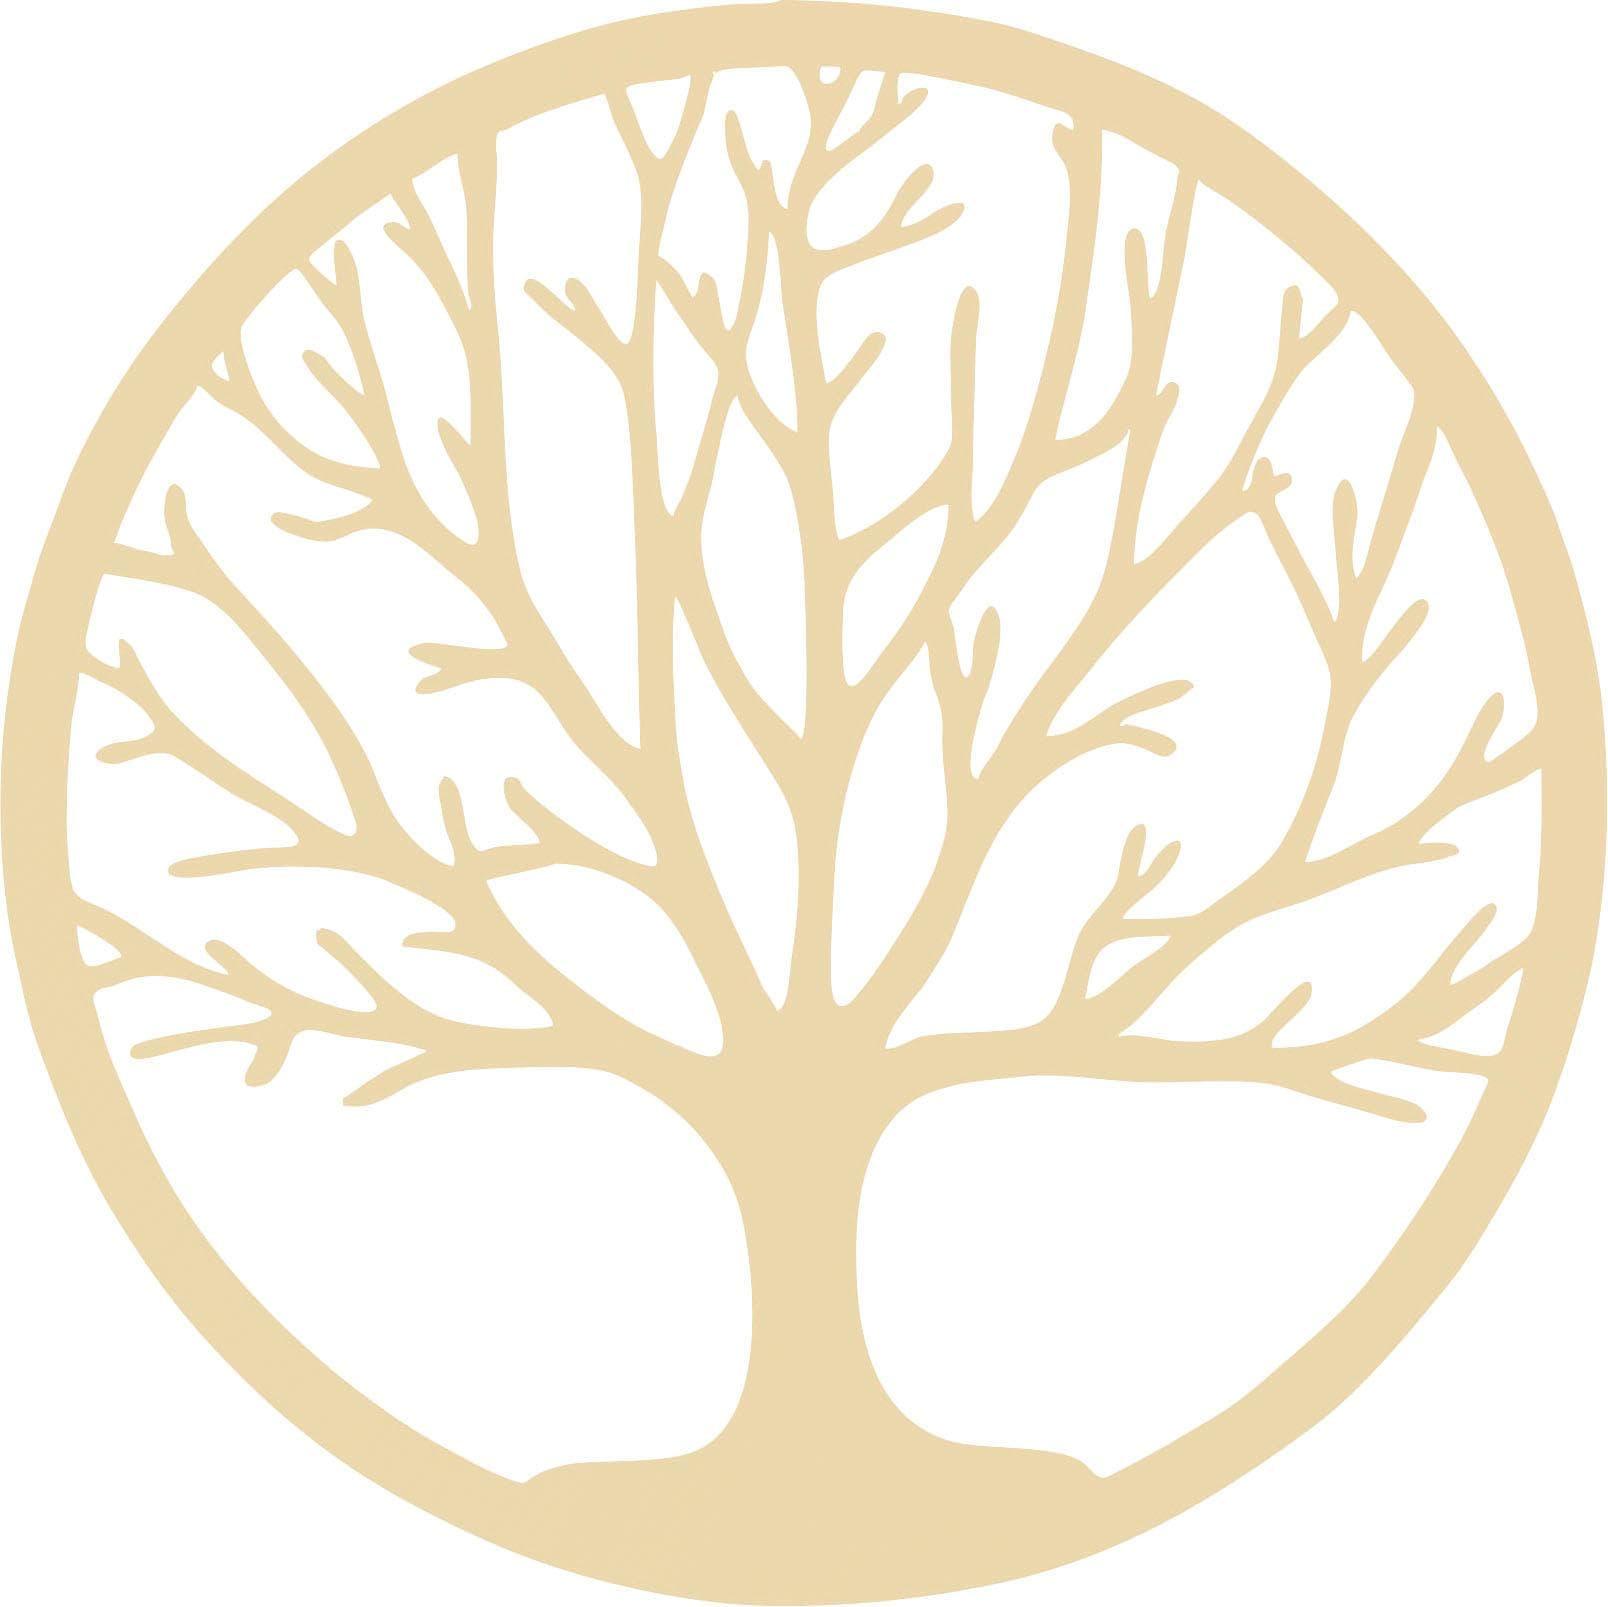 Wanddekoobjekt Holzdeko Pappel Furnier - Baum des Lebens beige Wanddekoration Deko Wohnaccessoires Wanddekoobjekte